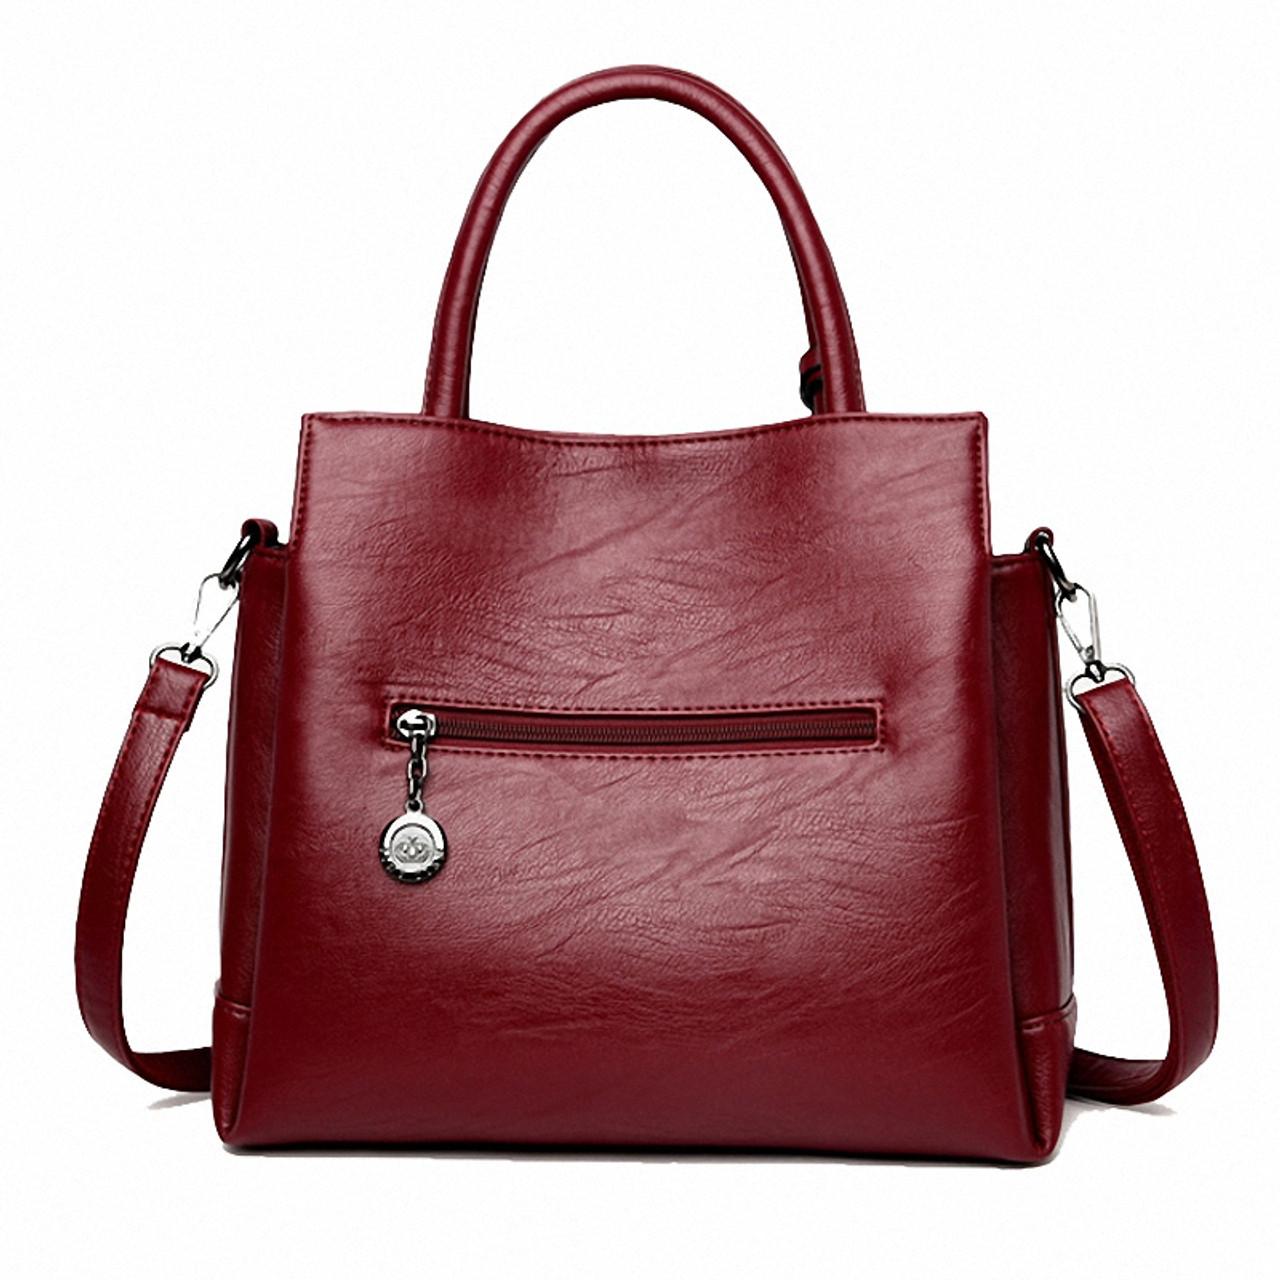 5a6a02a860 ... YASICAIDI Fashion Pu Leather Women Shoulder Bags Famous Designer  Vintage Tassel Large Women Messenger Bags Ladies ...